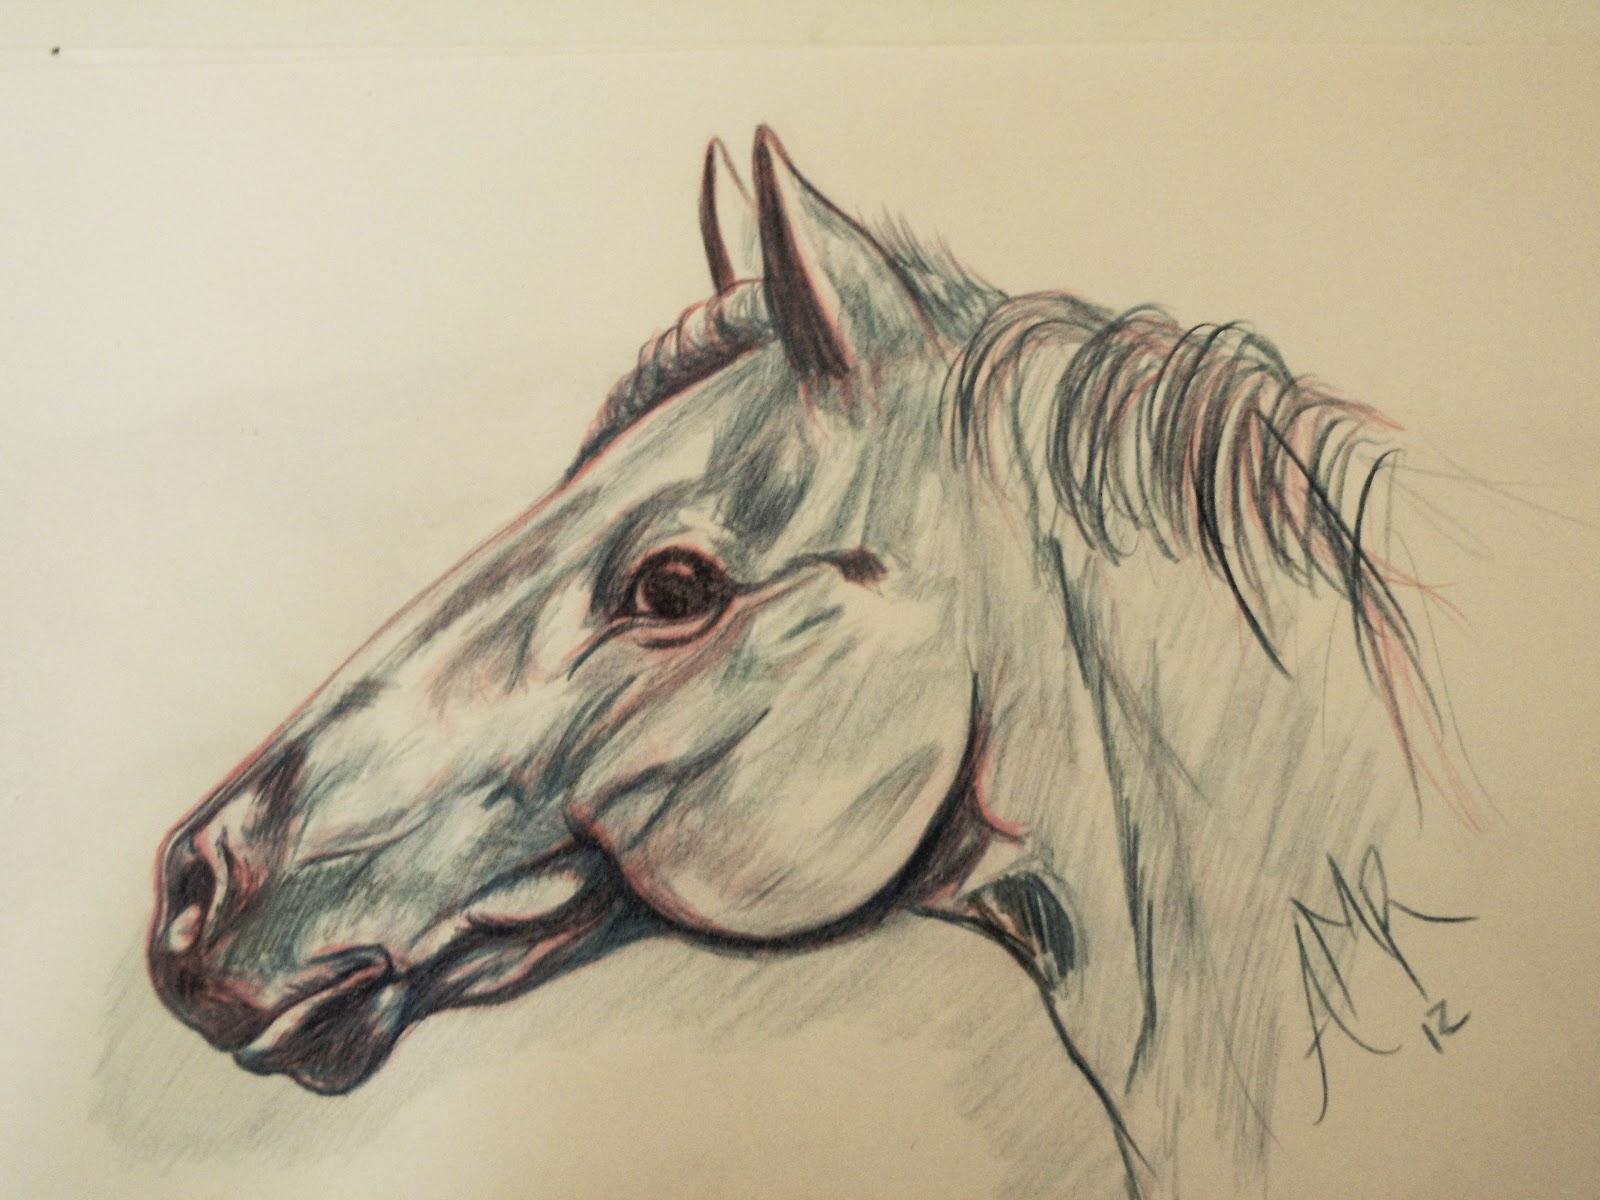 DESIGN ART dibujo cabeza de caballo en lapiz de color